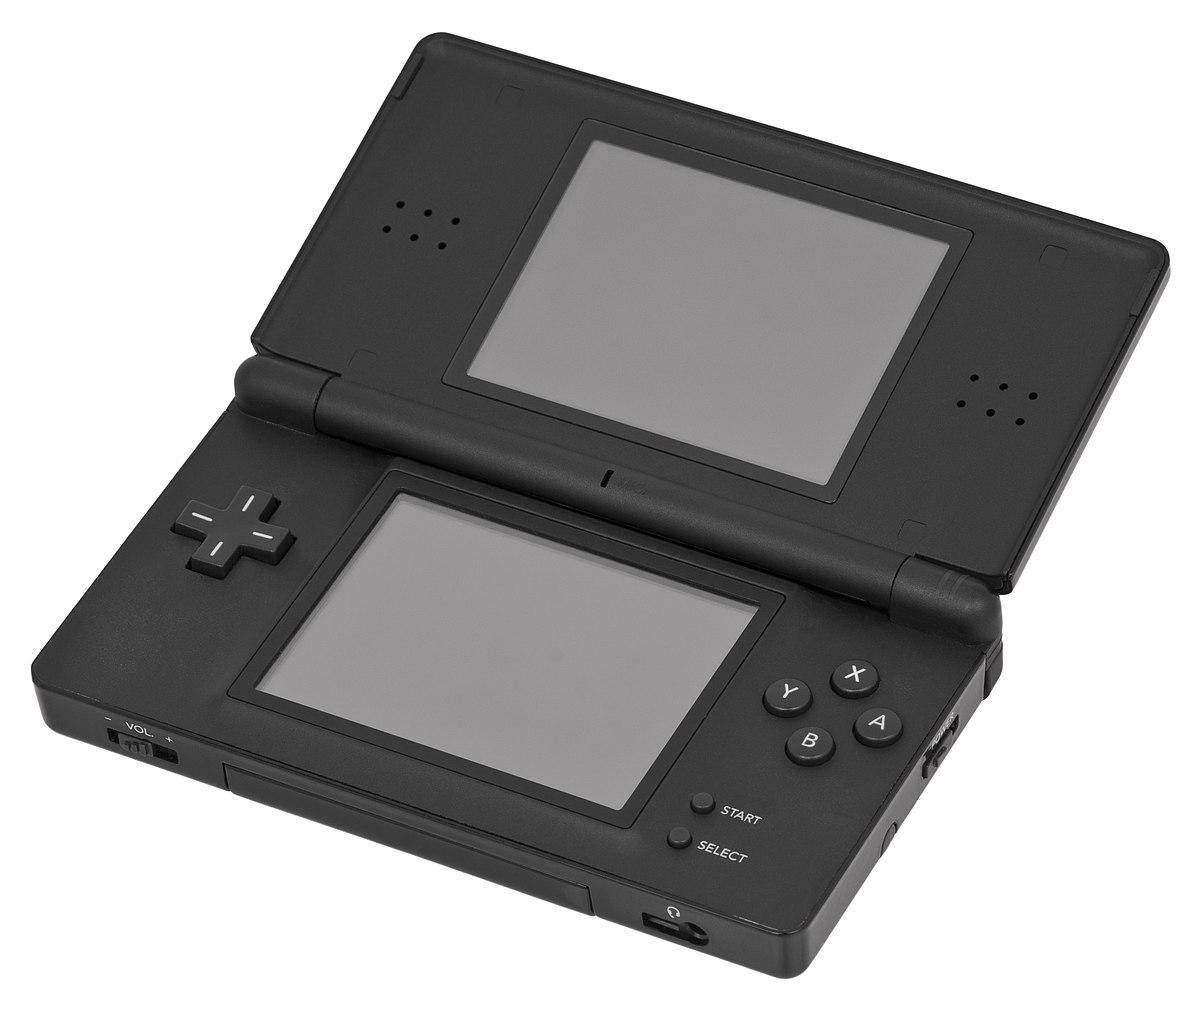 Nintendo Ds Walkthrough A brief buying g...